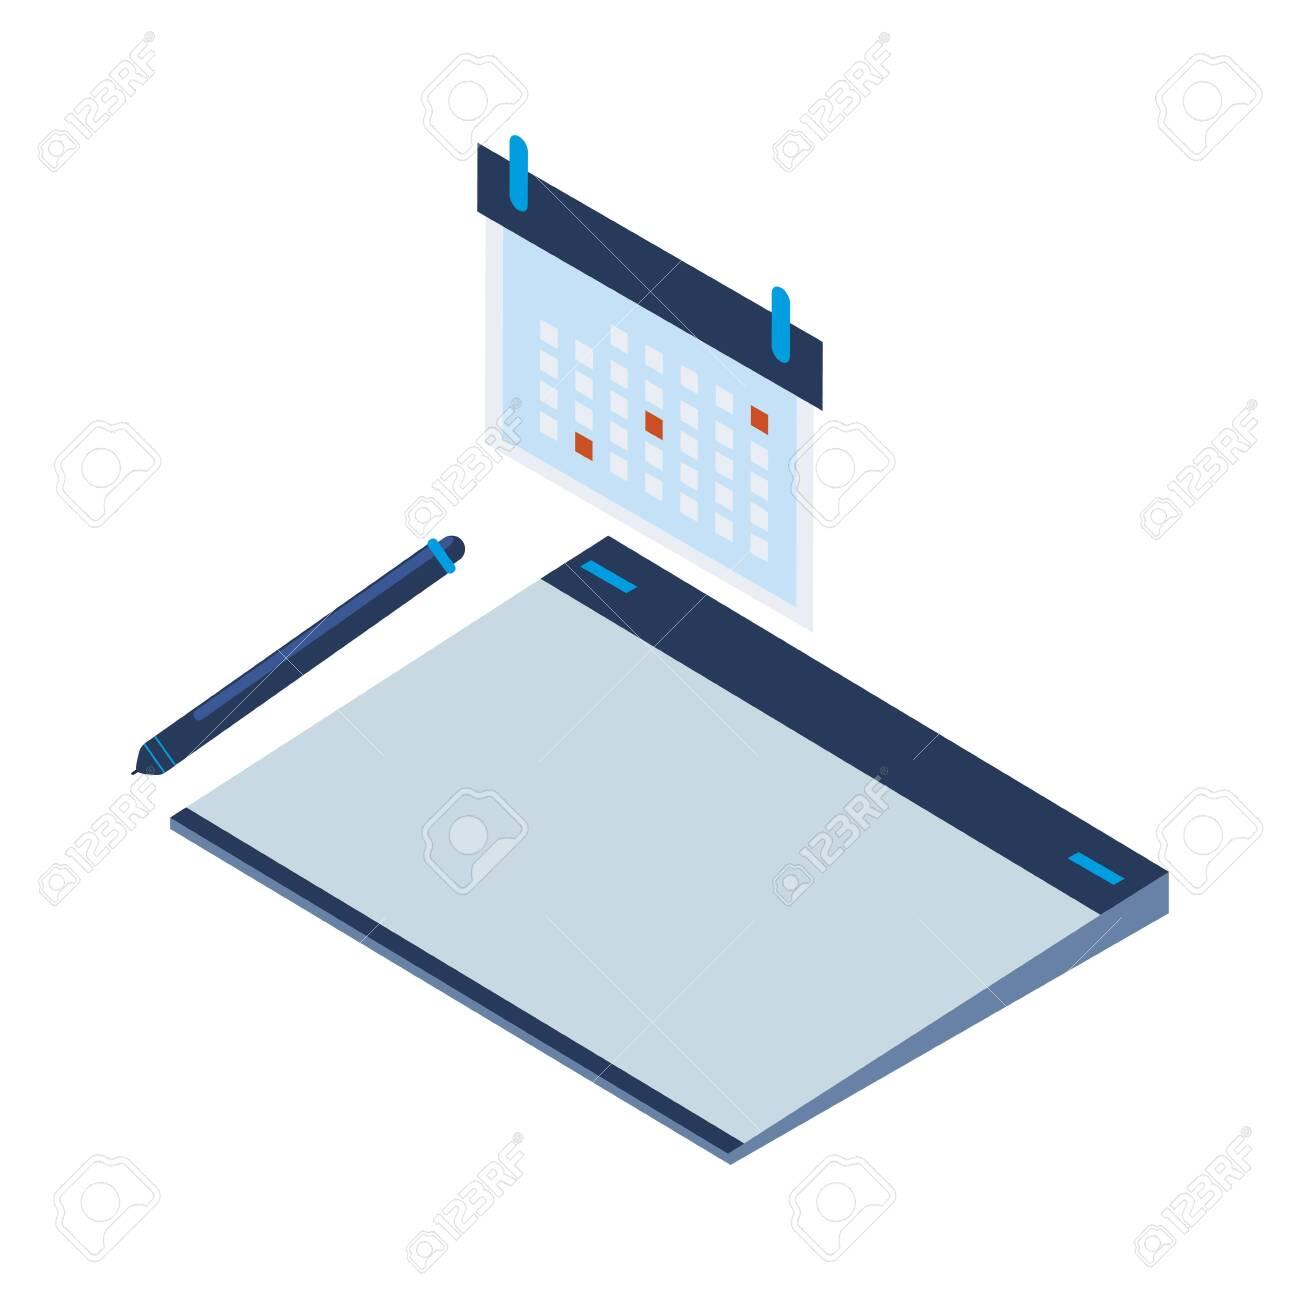 graphic design board and calendar vector illustration design - 123887866